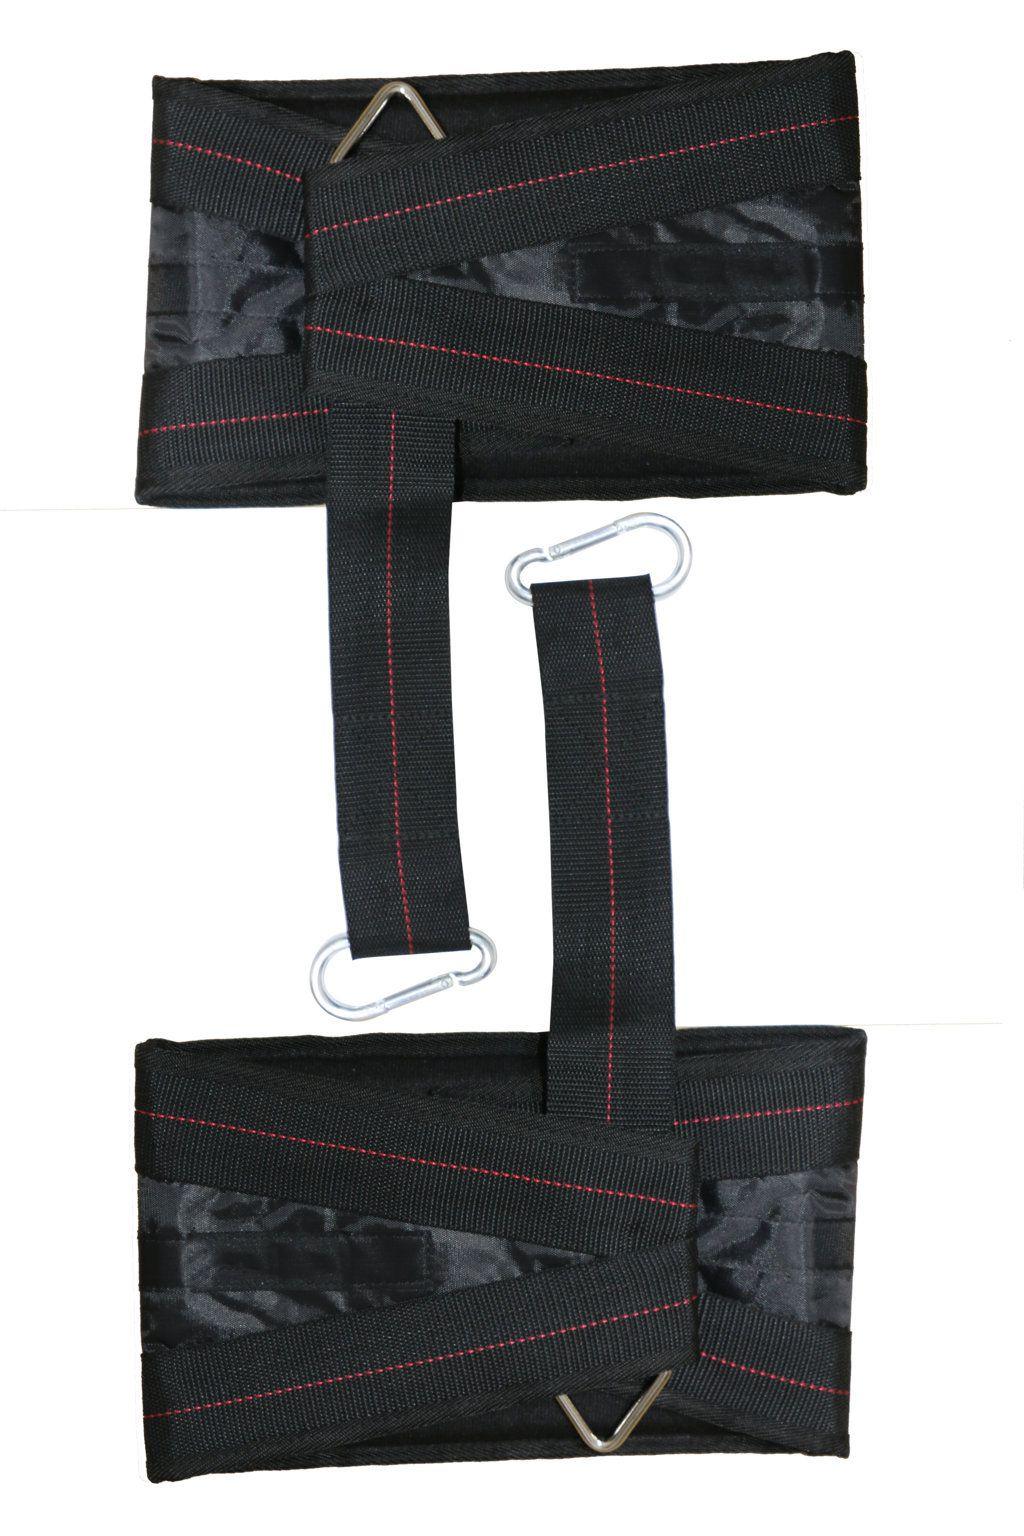 Tipóia para Abdominal Suspenso em Nylon (Par) - ODIN FIT